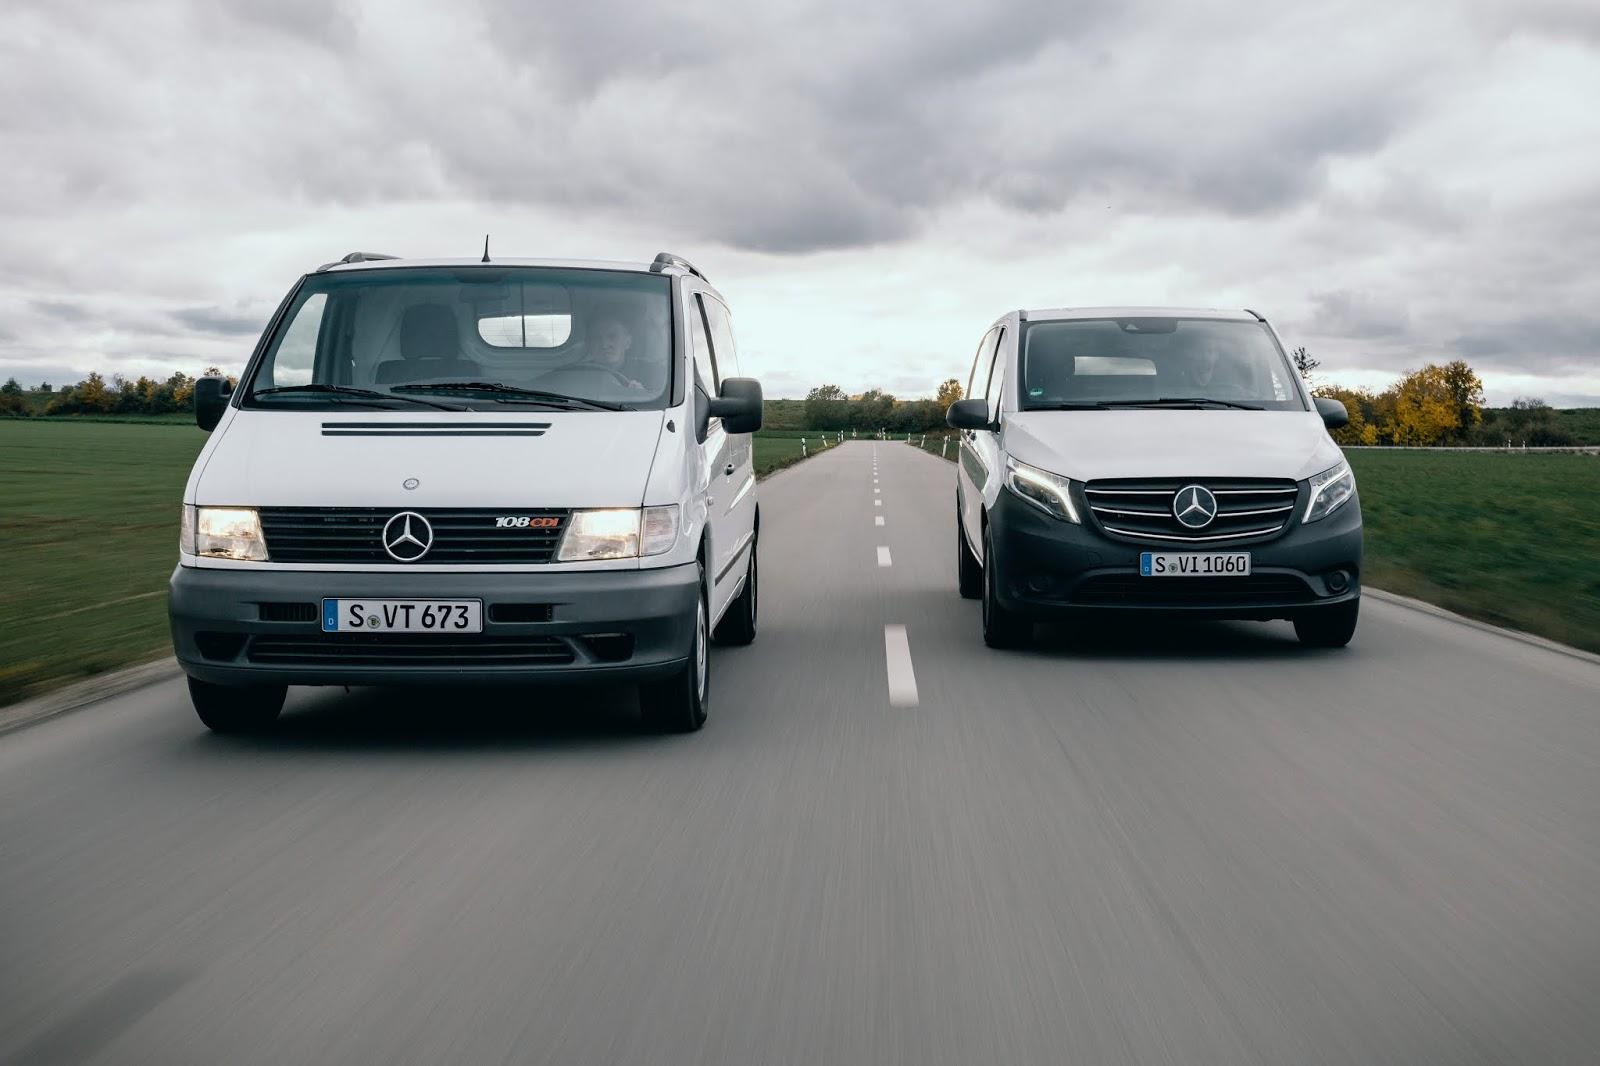 21C0120 001 Mercedes-Benz Vito : Συνεργάτης εδώ και 25 χρόνια